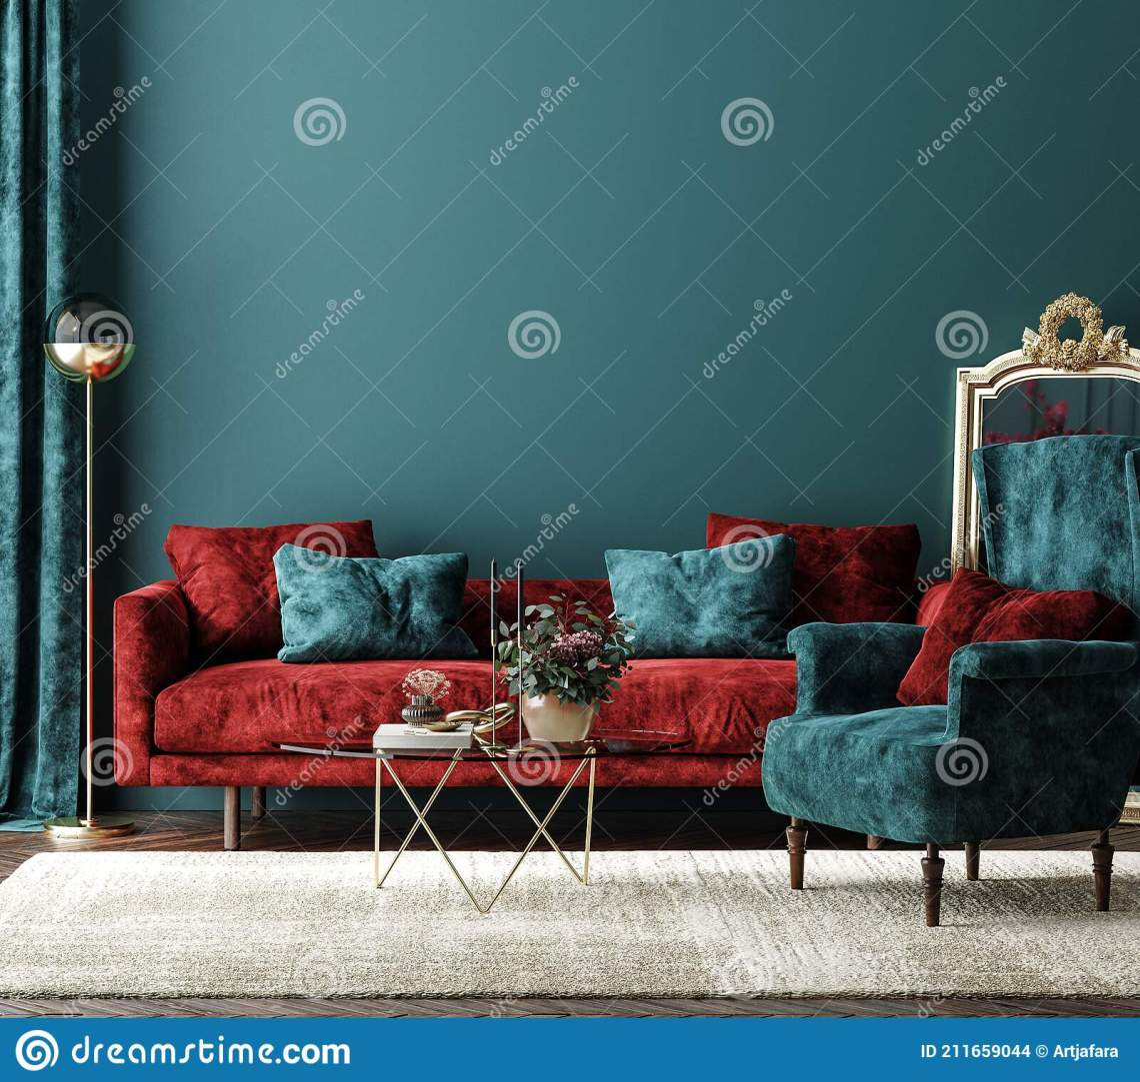 Modern Red Sofa Green Luxury Interior Stock Illustrations 1 266 Modern Red Sofa Green Luxury Interior Stock Illustrations Vectors Clipart Dreamstime